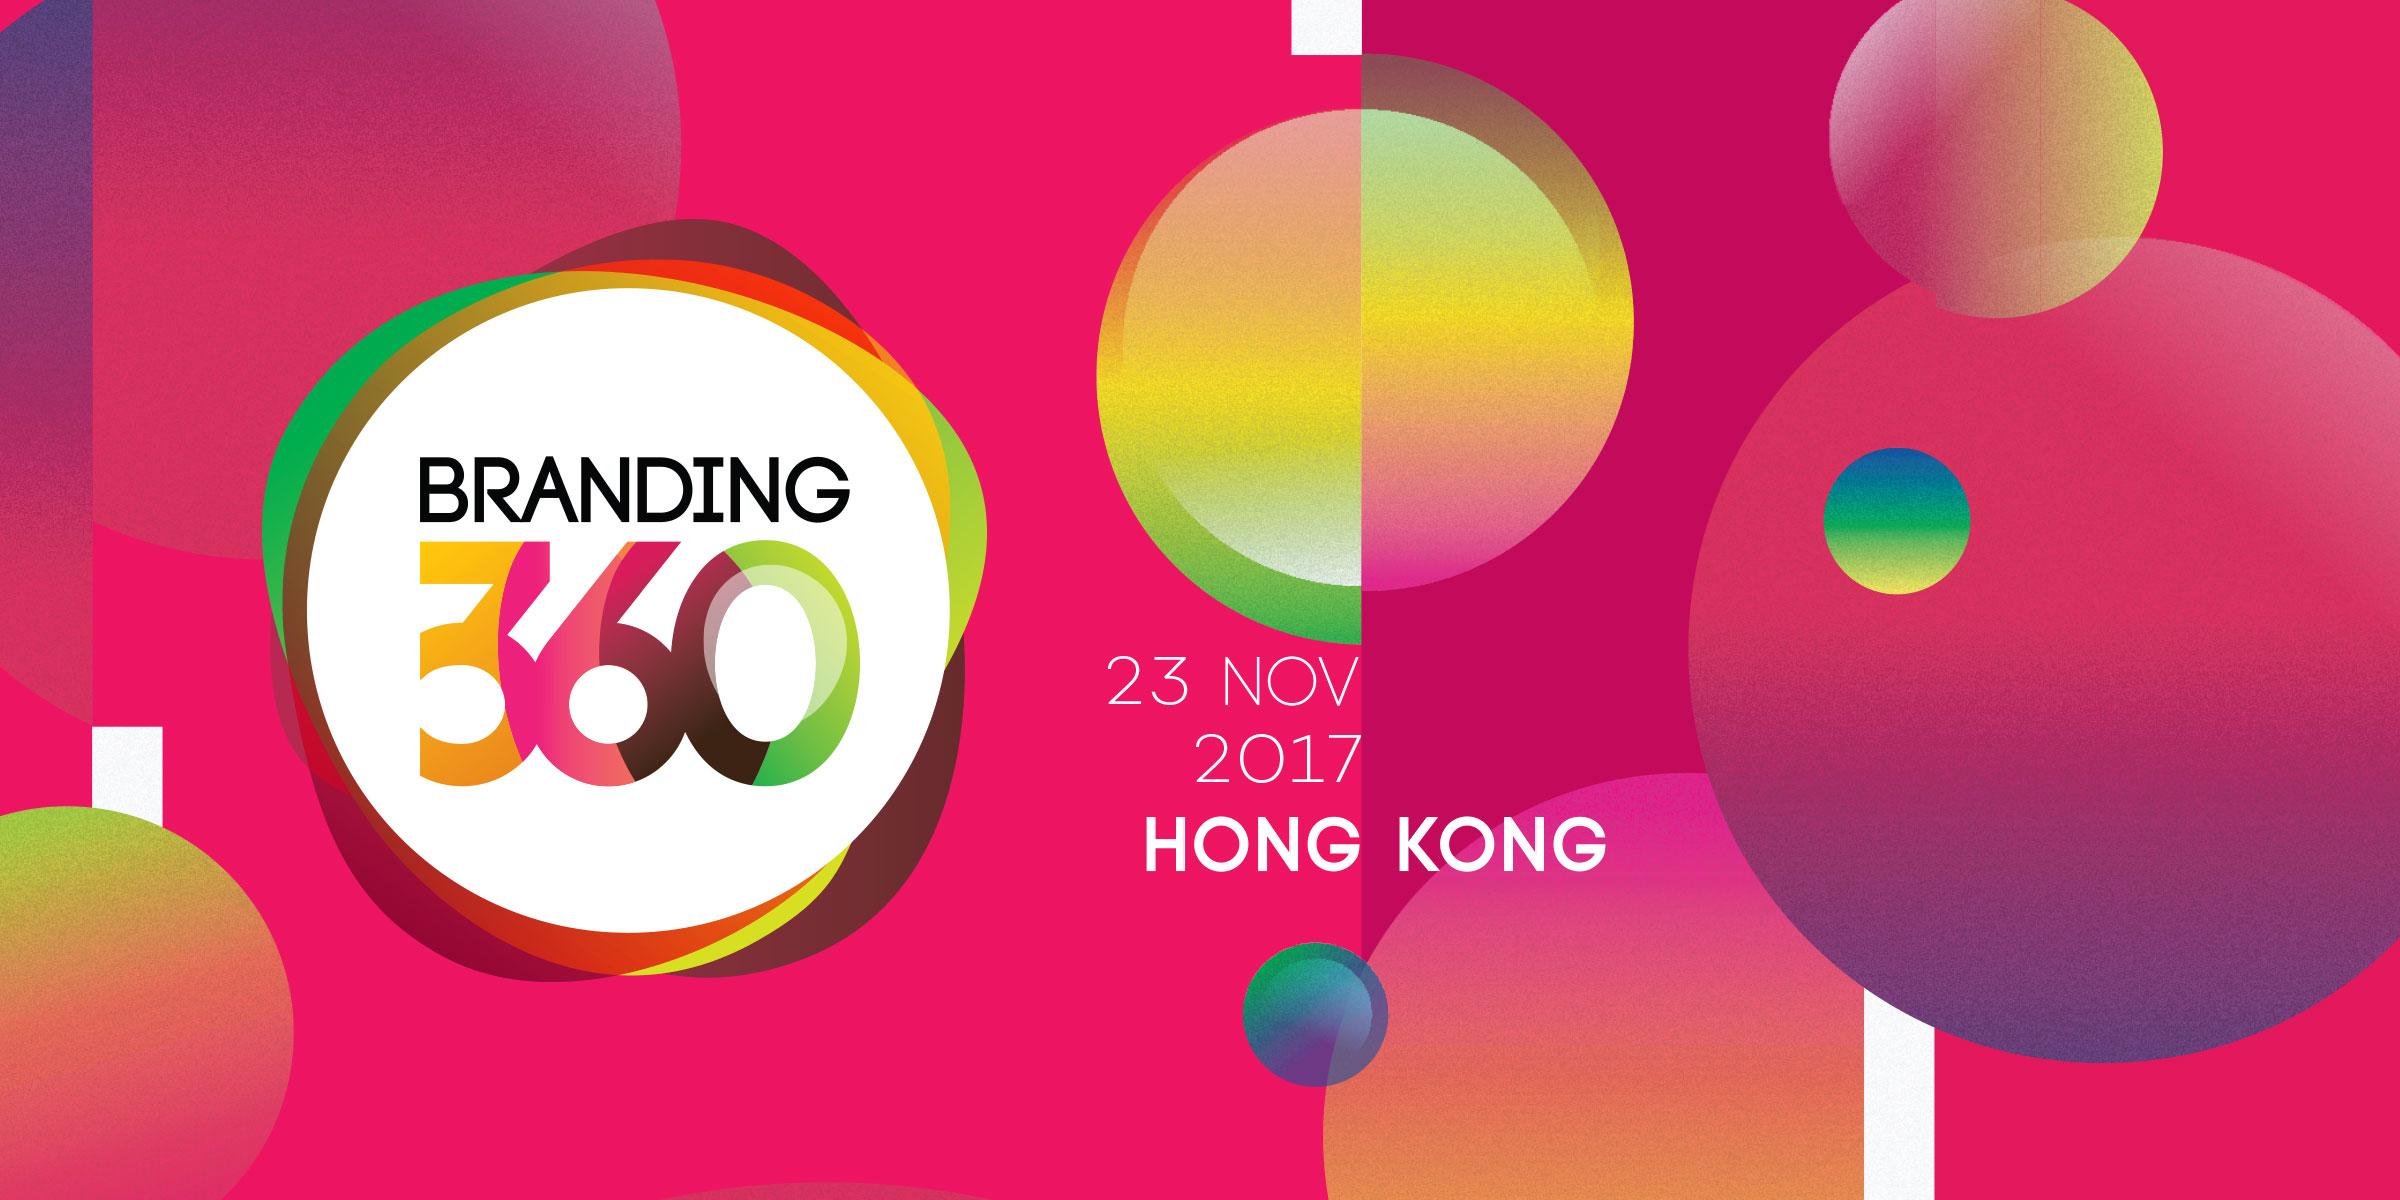 Branding 360 2017